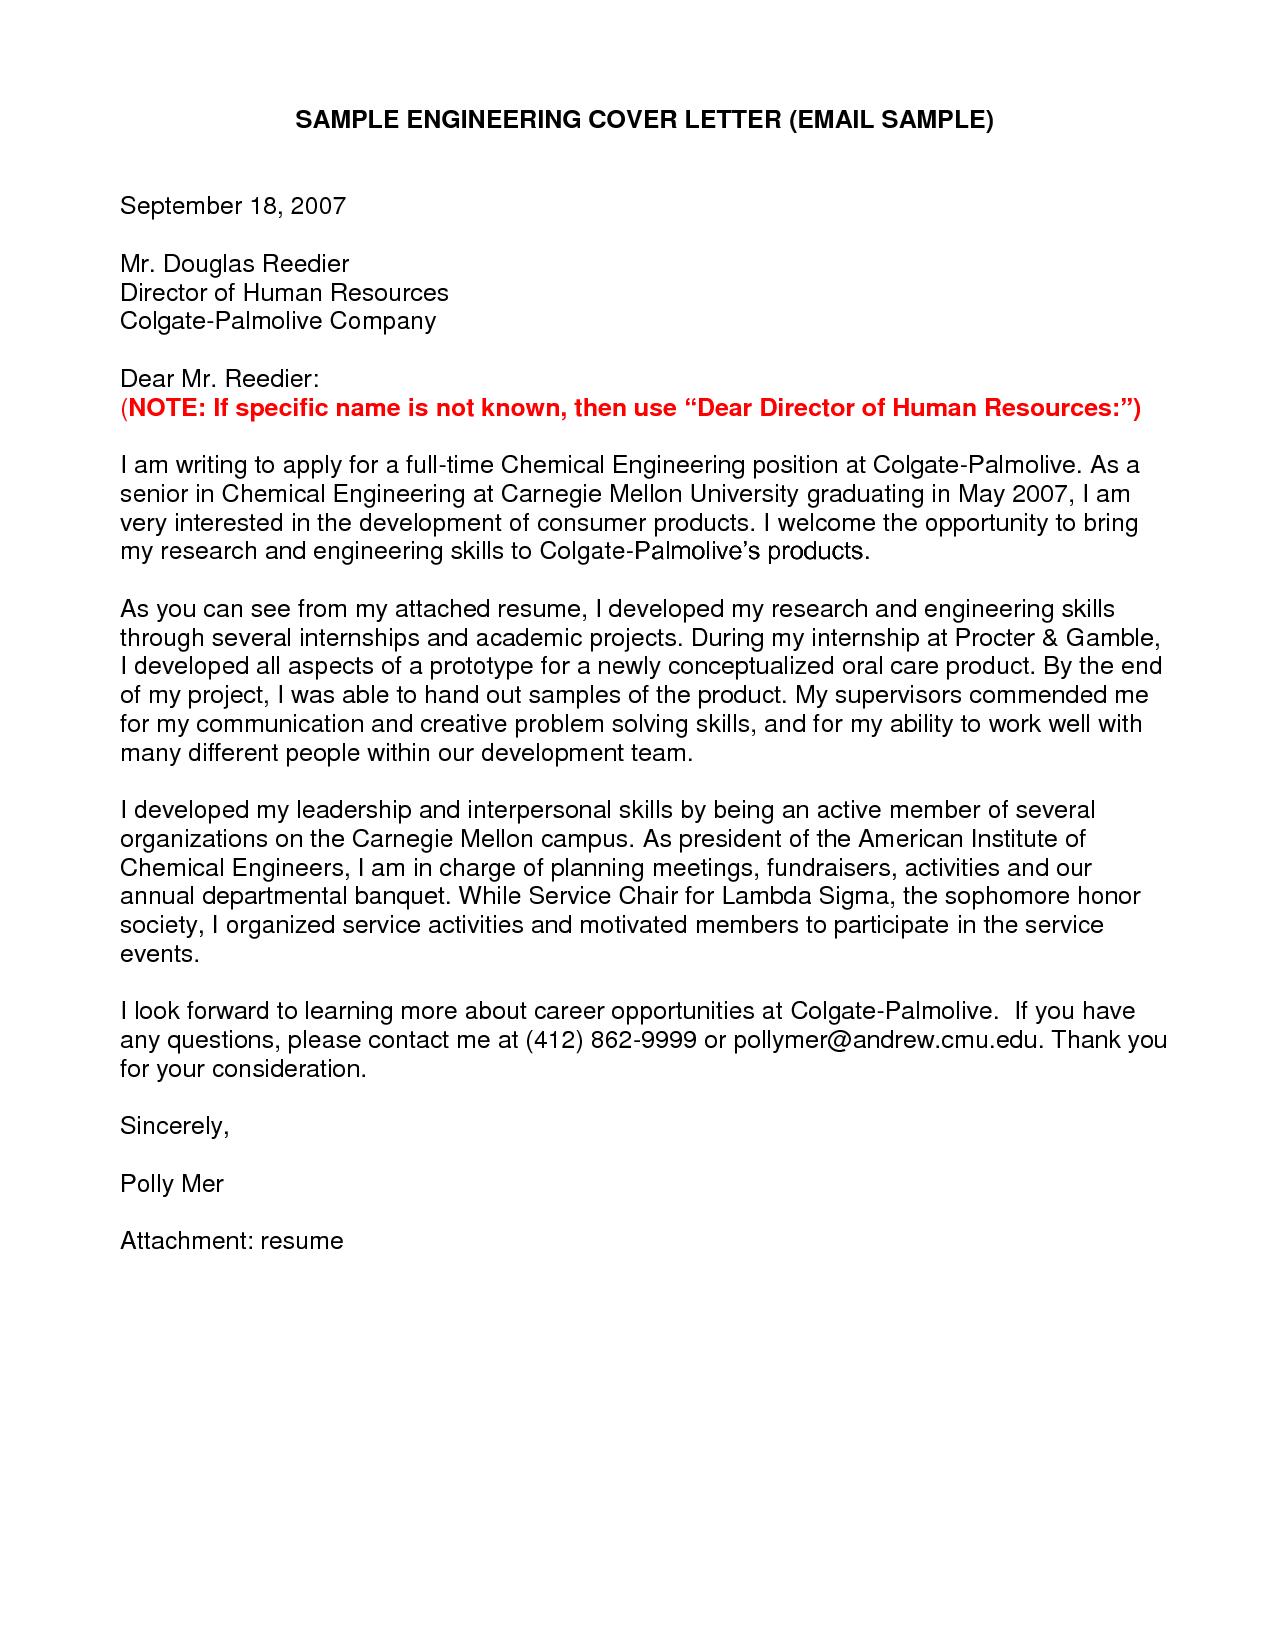 Student Cover Letter For Resume Resume Cover Letter Engineering Student Cover Letter  News To Gow .